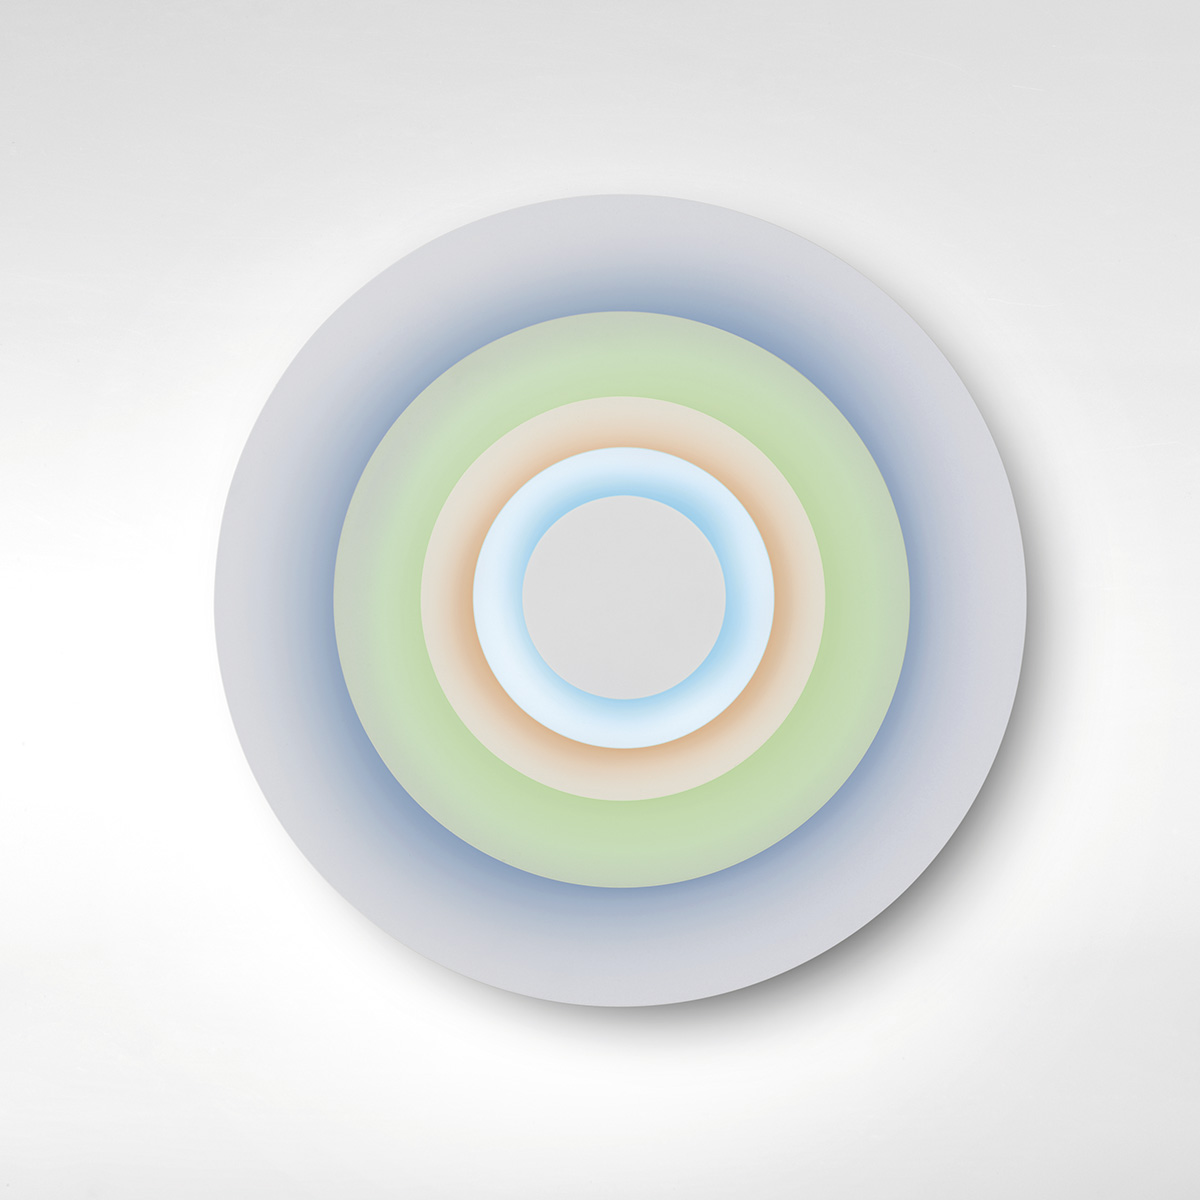 05-concentric-rob-zinn-marset